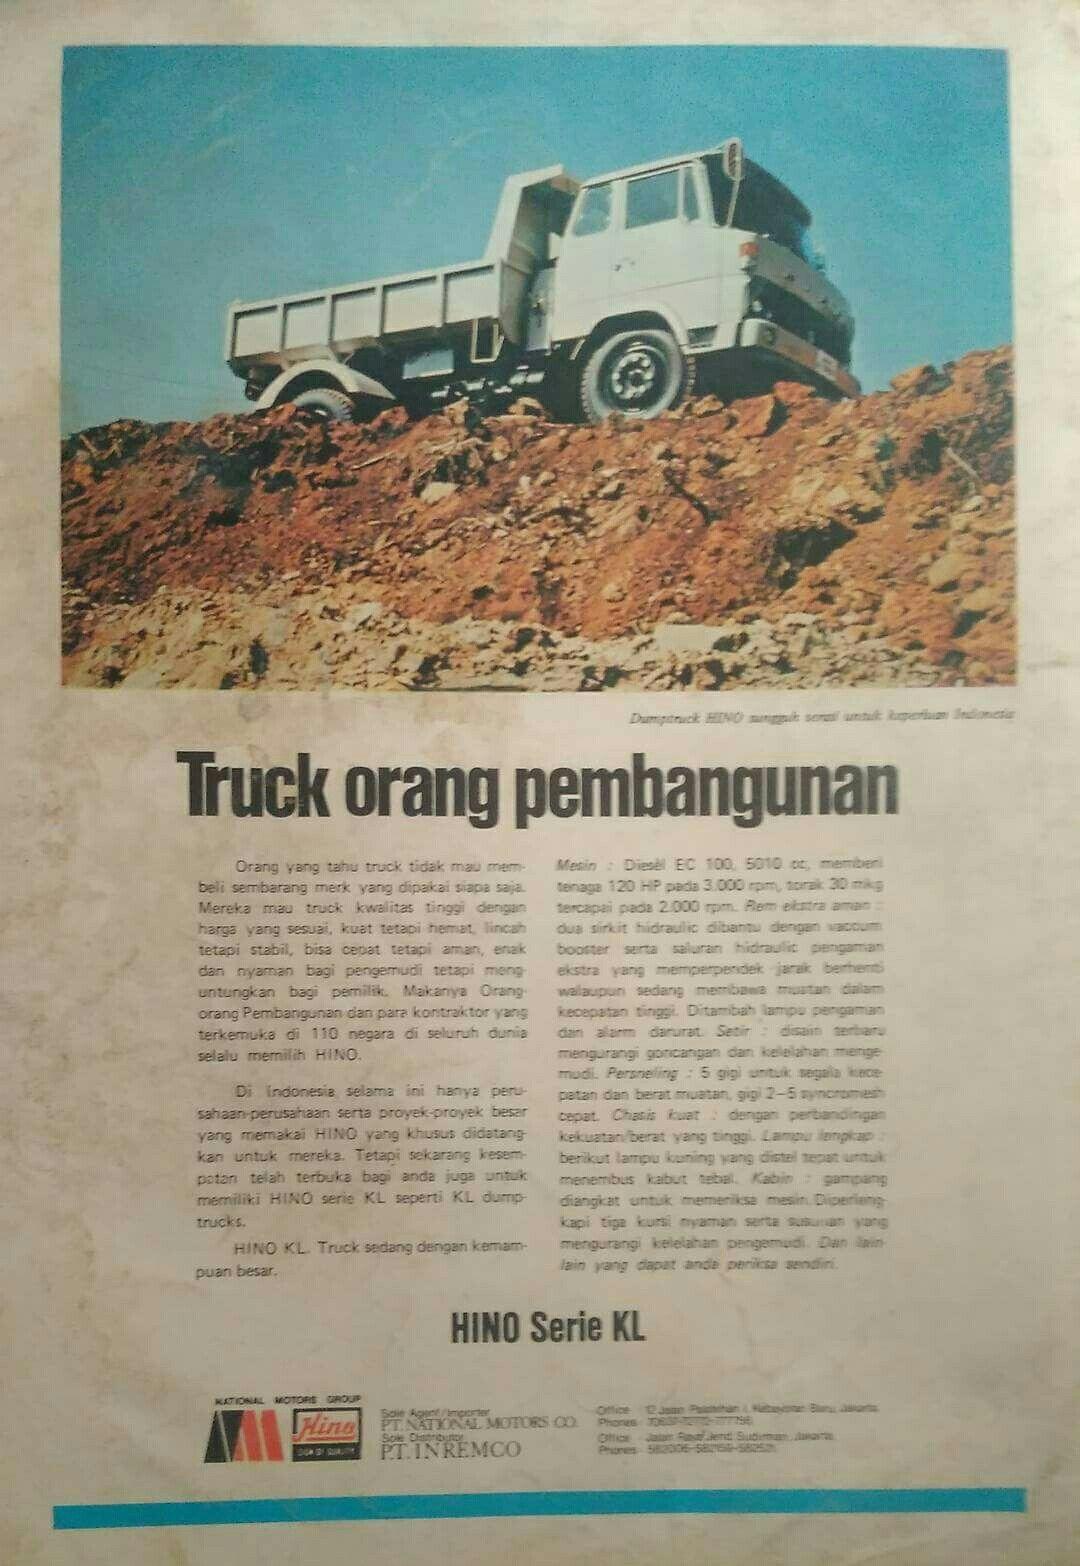 Hino Truck Tahu Bangunan